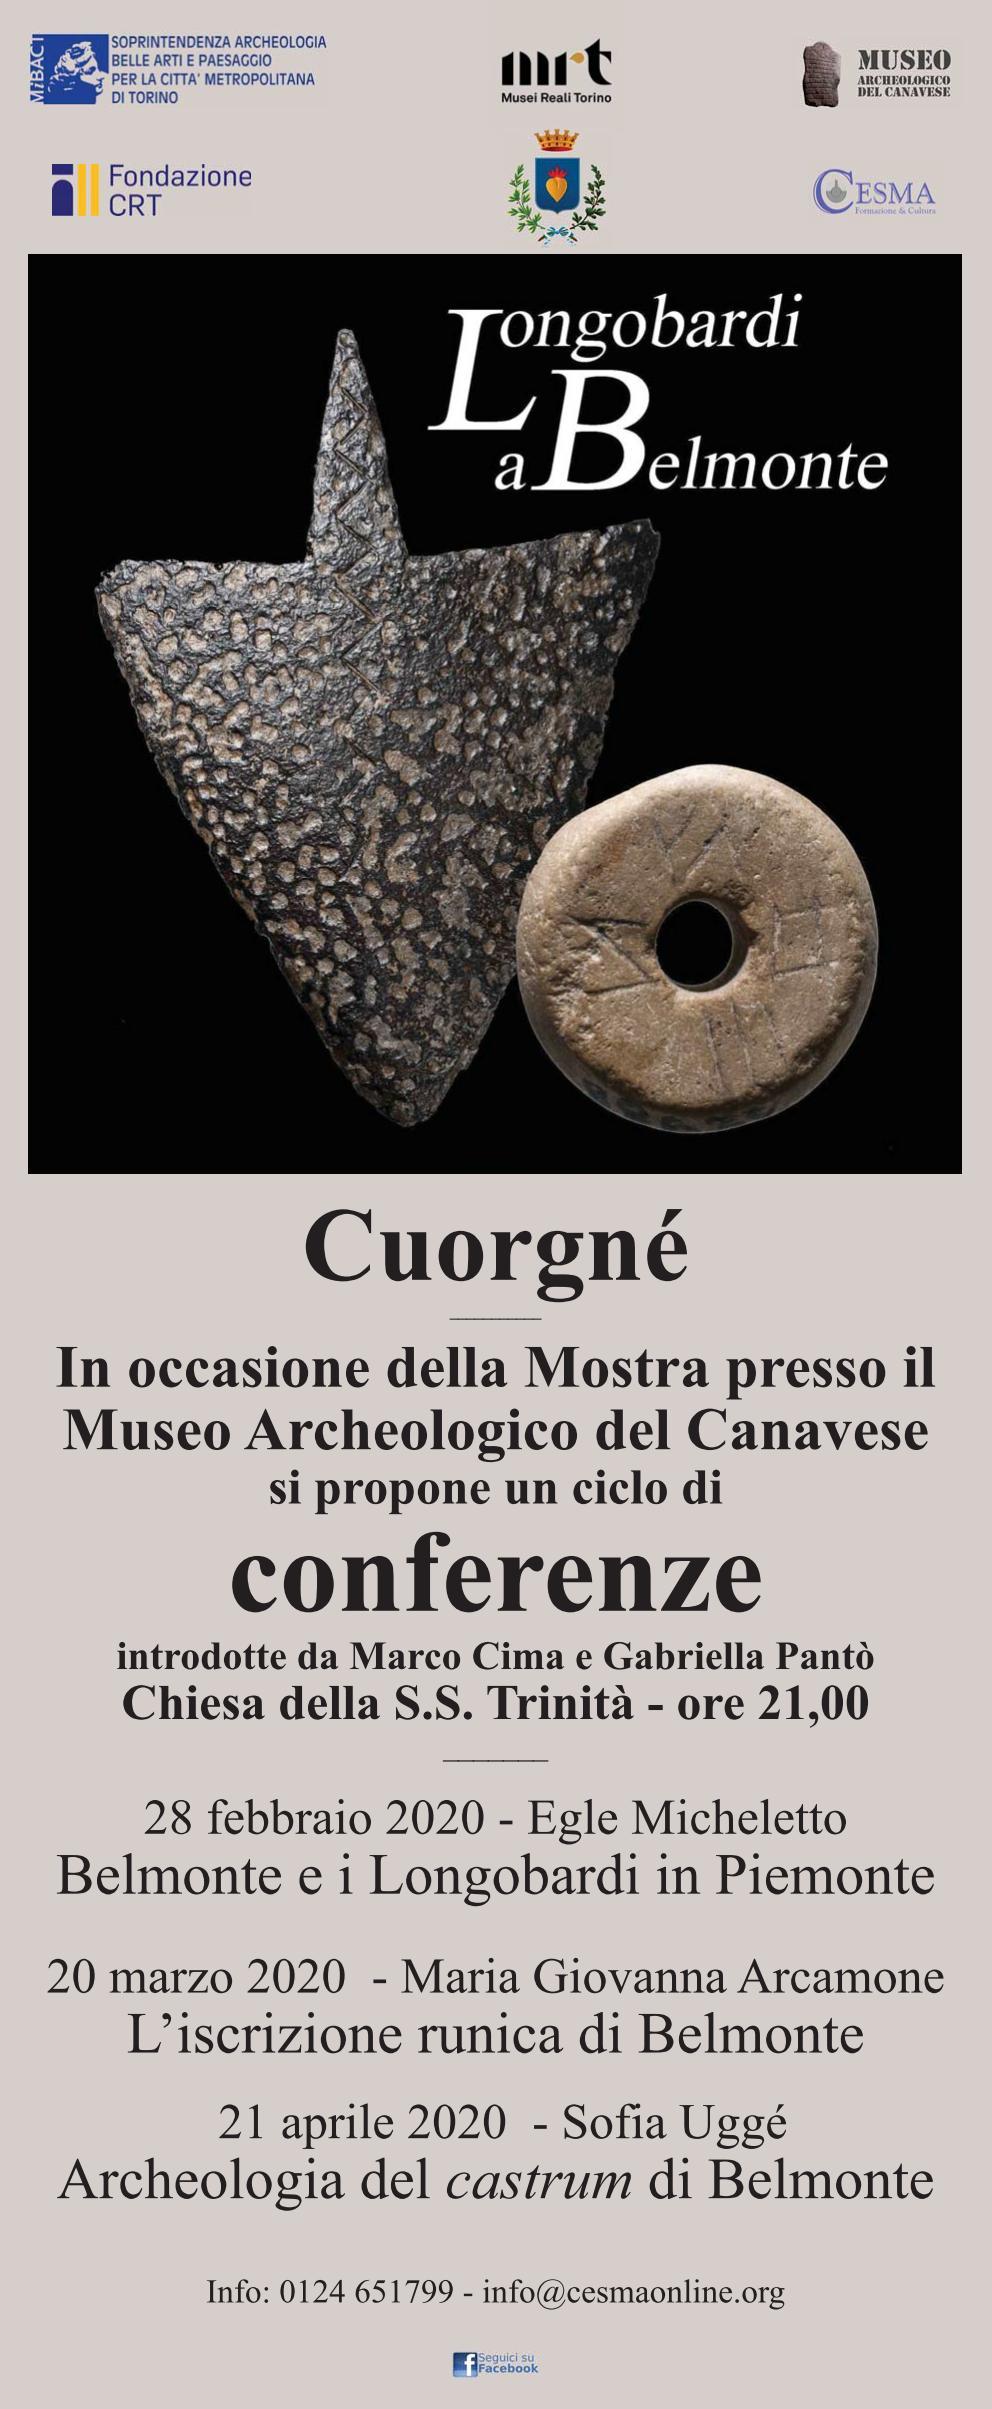 Cuorgne_locandina_conferenze_longobardi